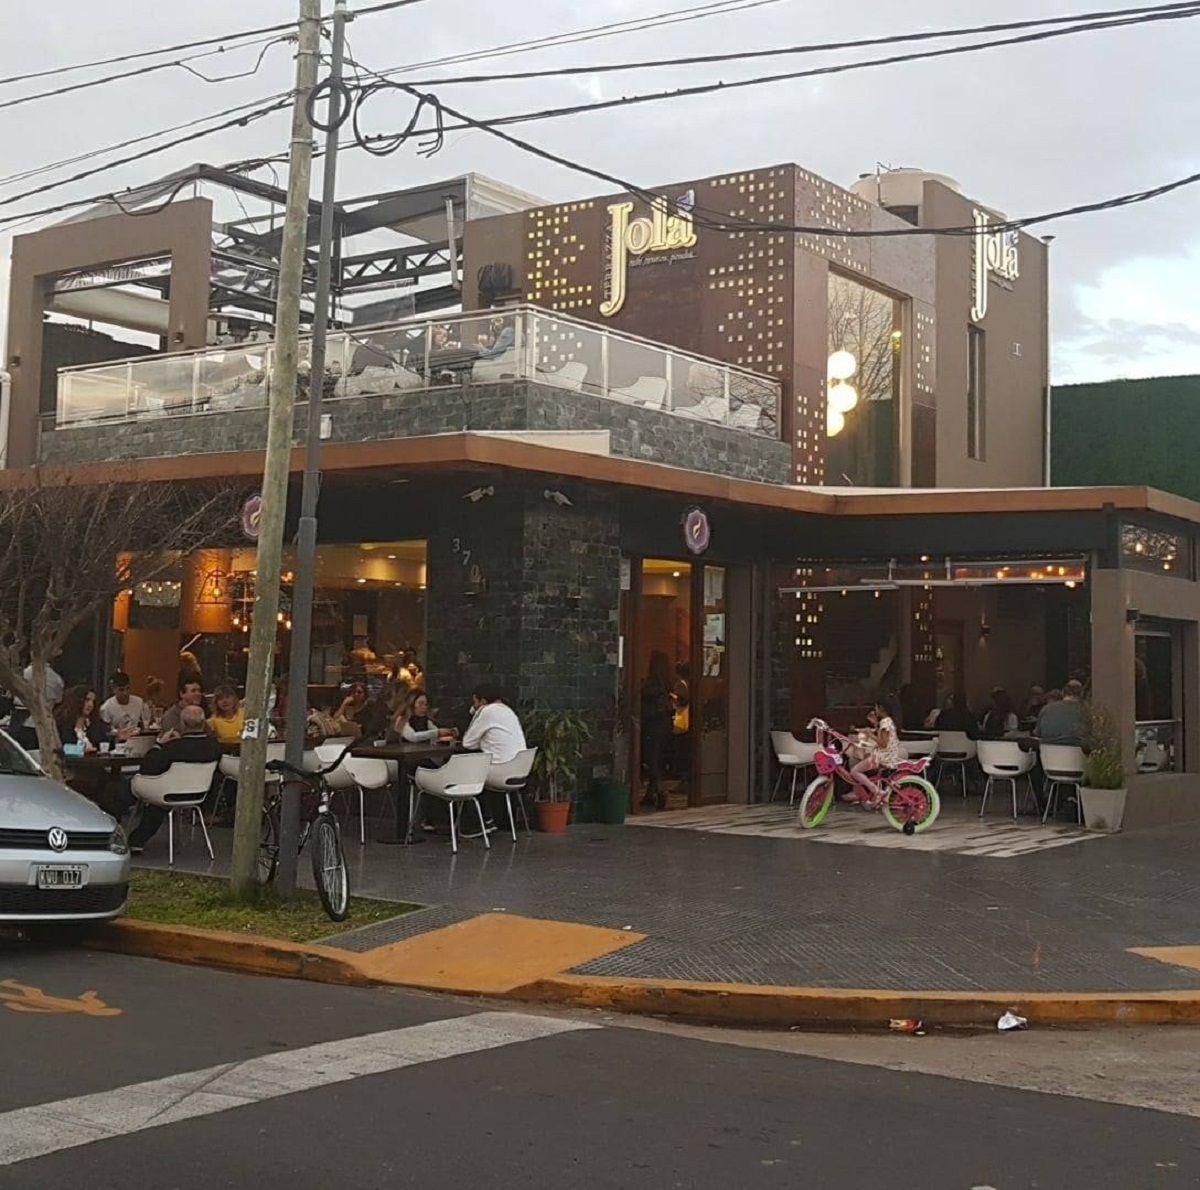 Restaurante Jolá